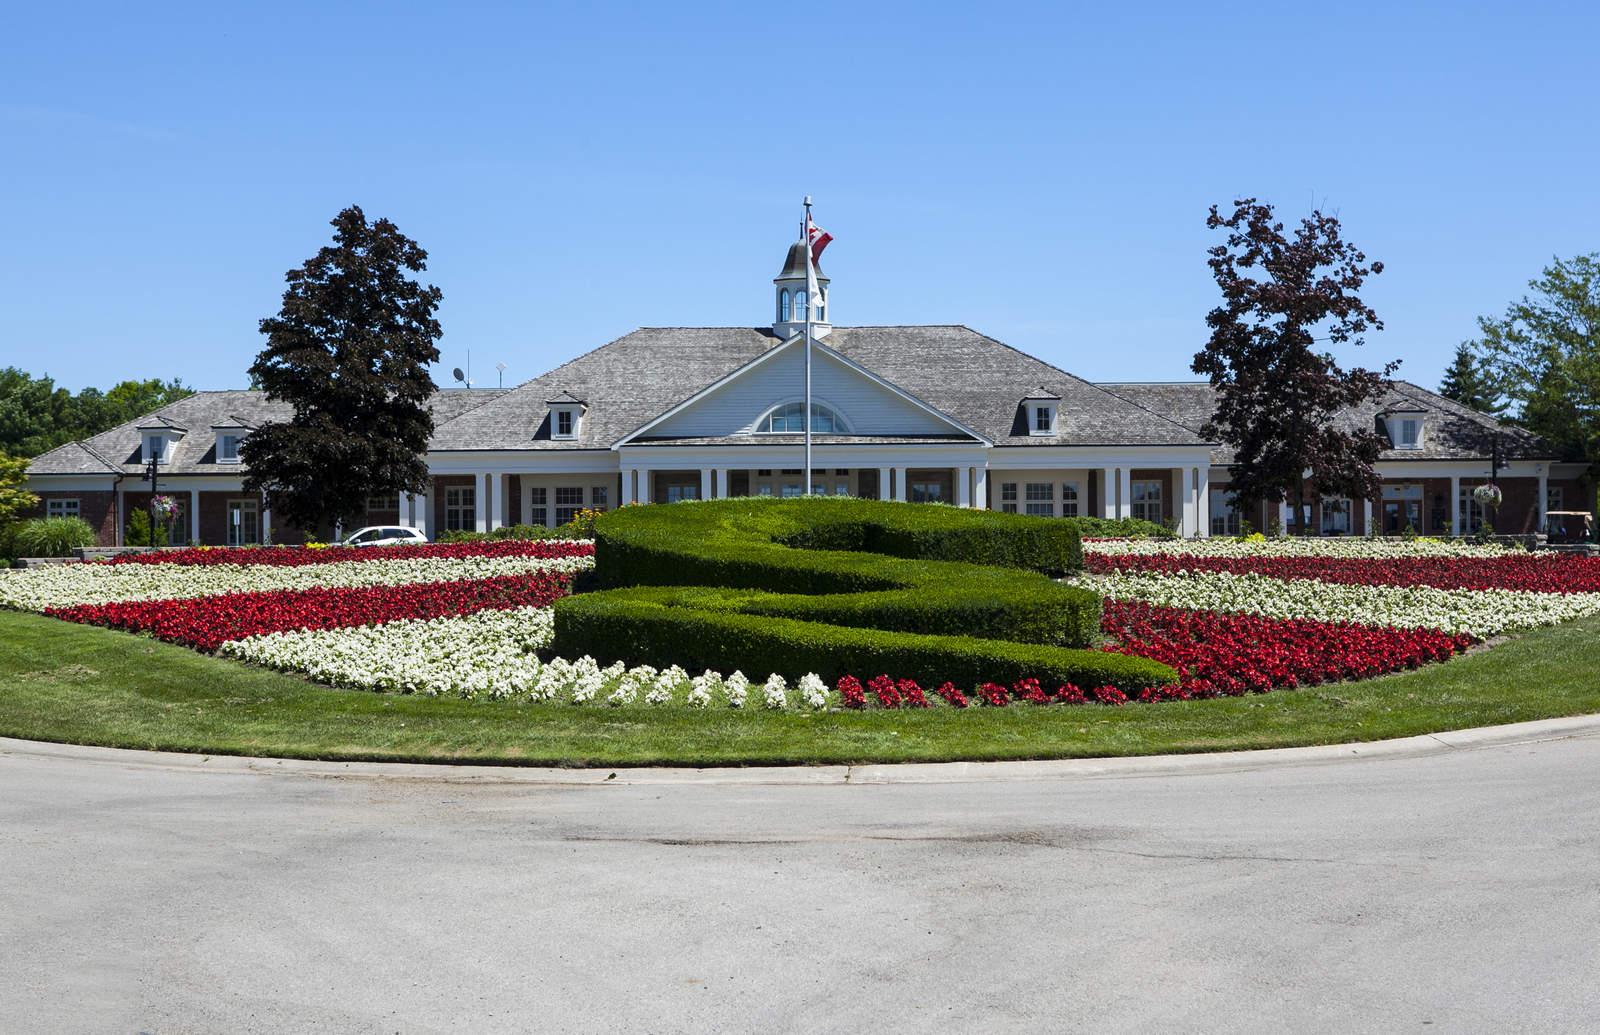 RattleSnake Point Golf Club